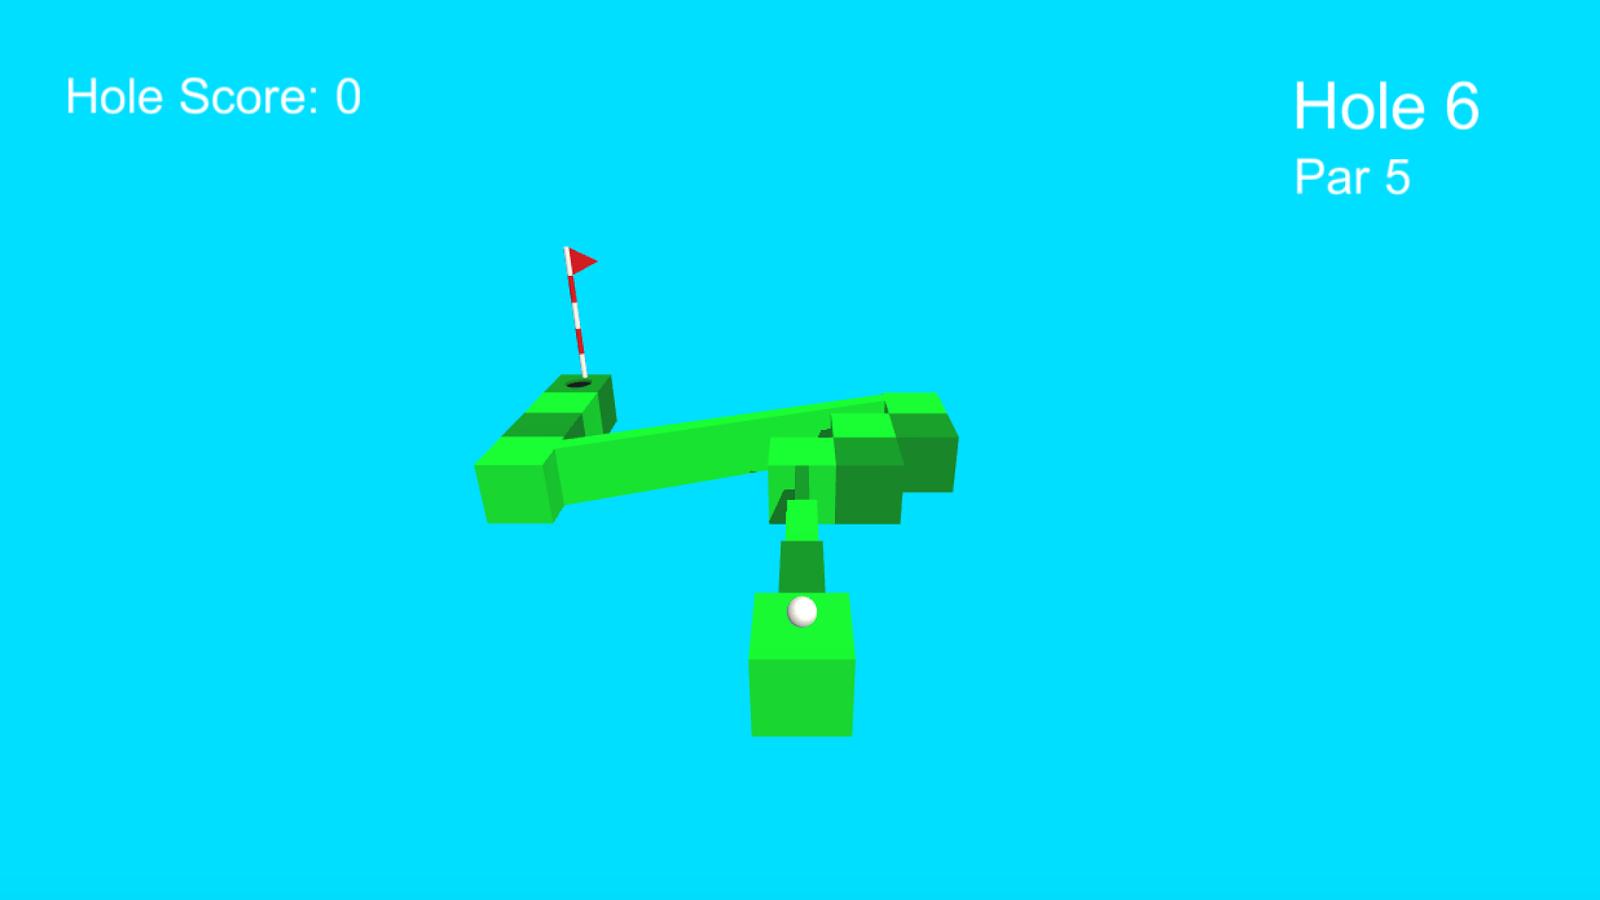 TipTap-Golf 18